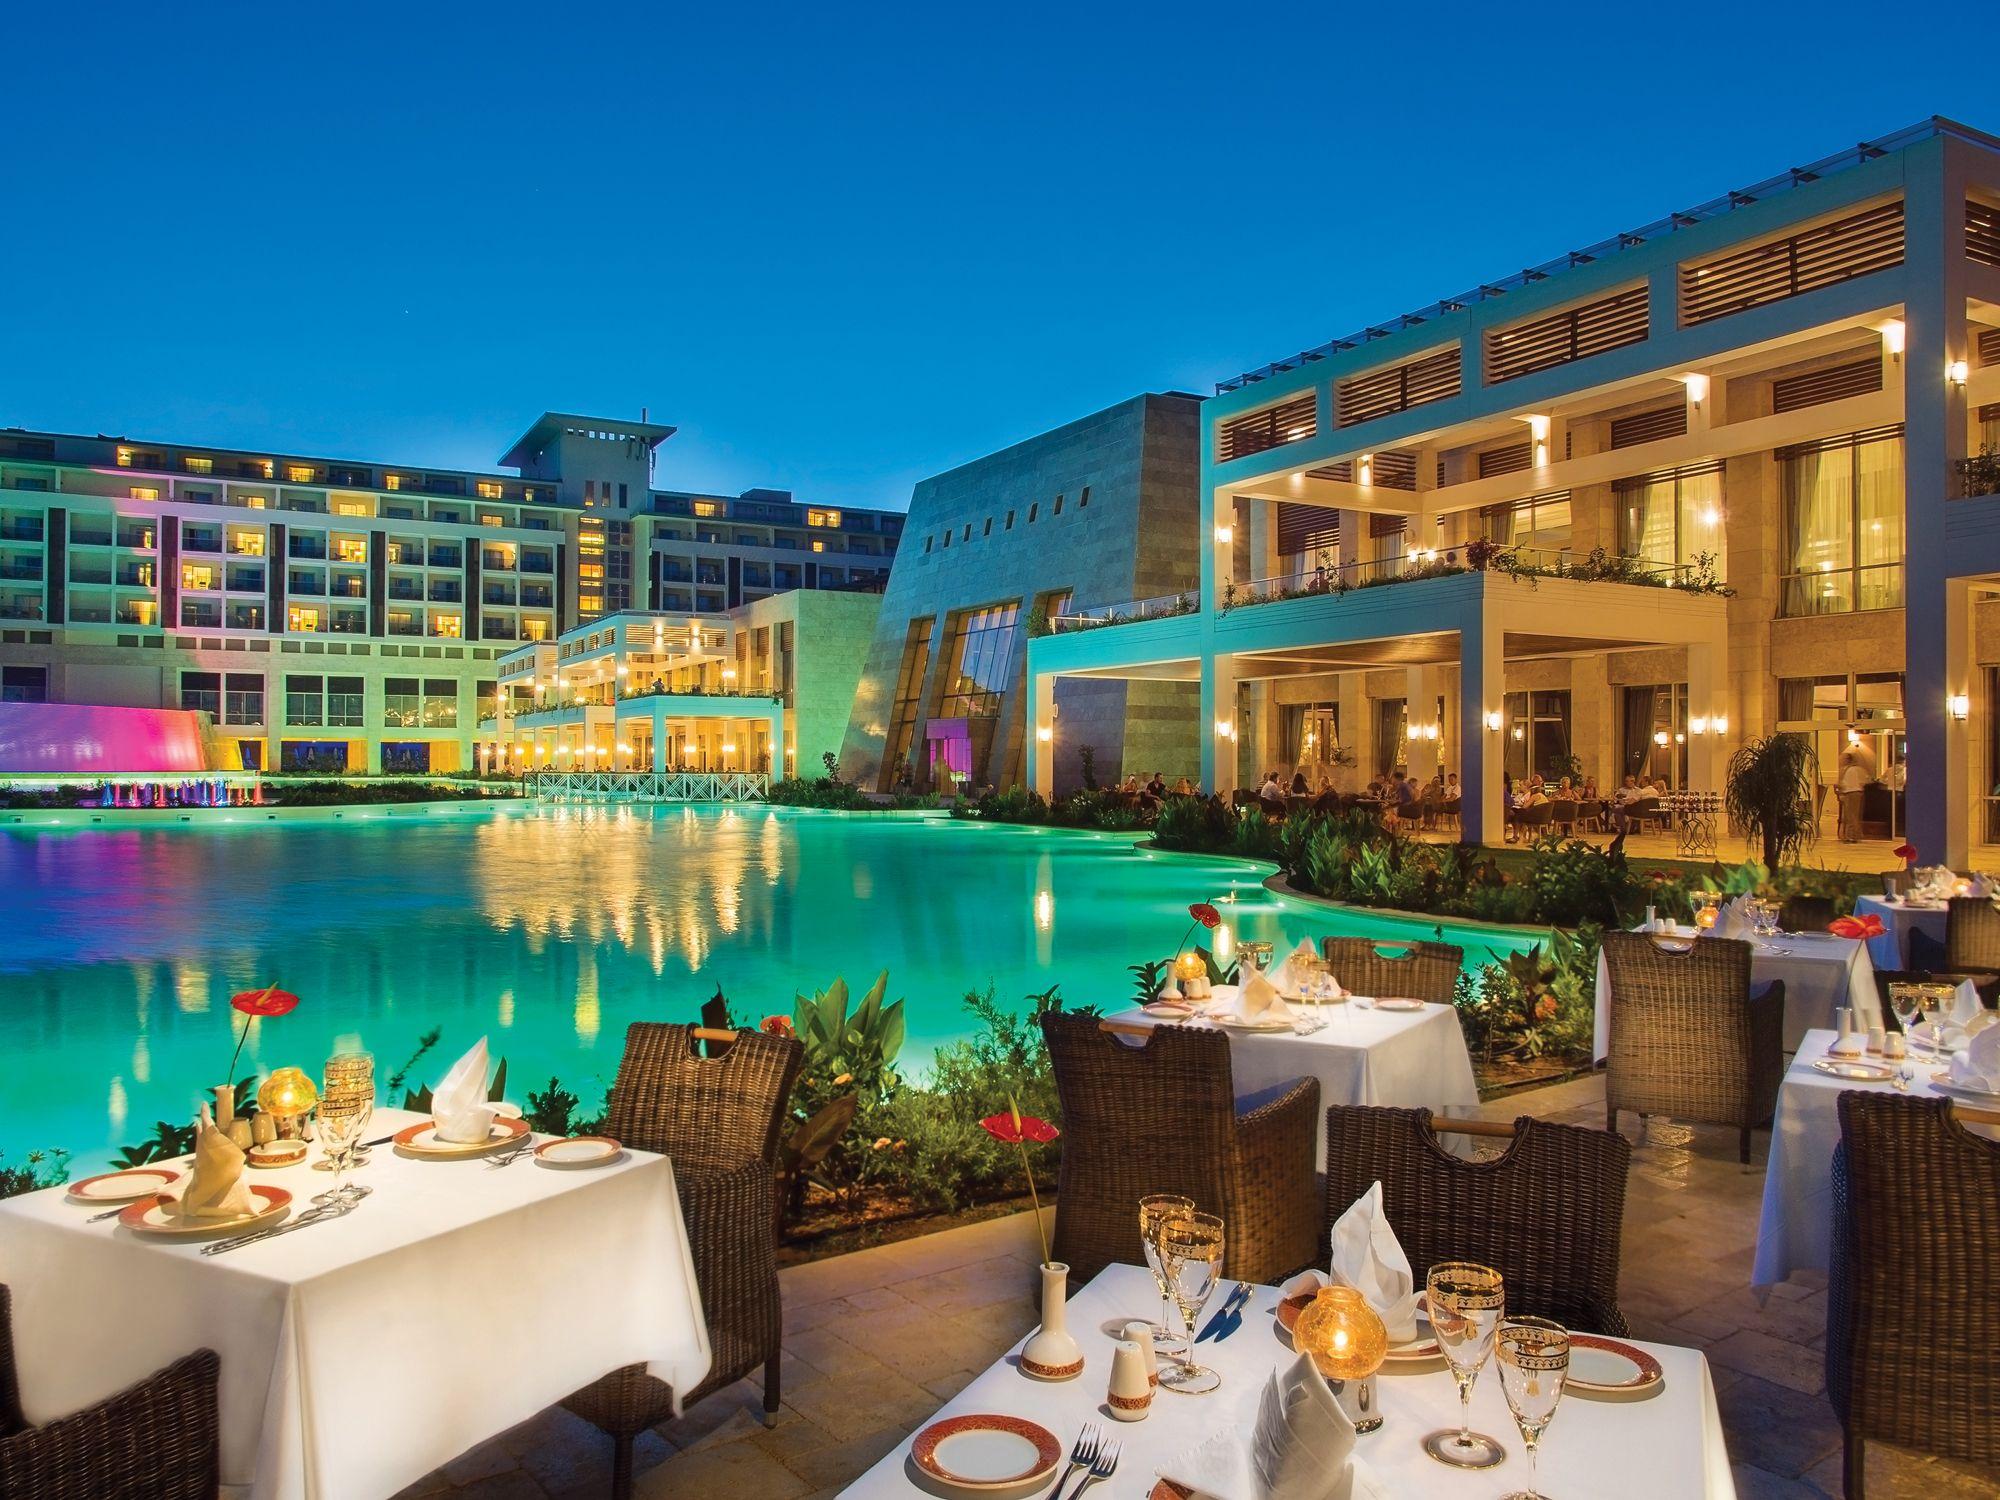 Luxury Hotel Premium Hotel Luxury Hotel Hotel